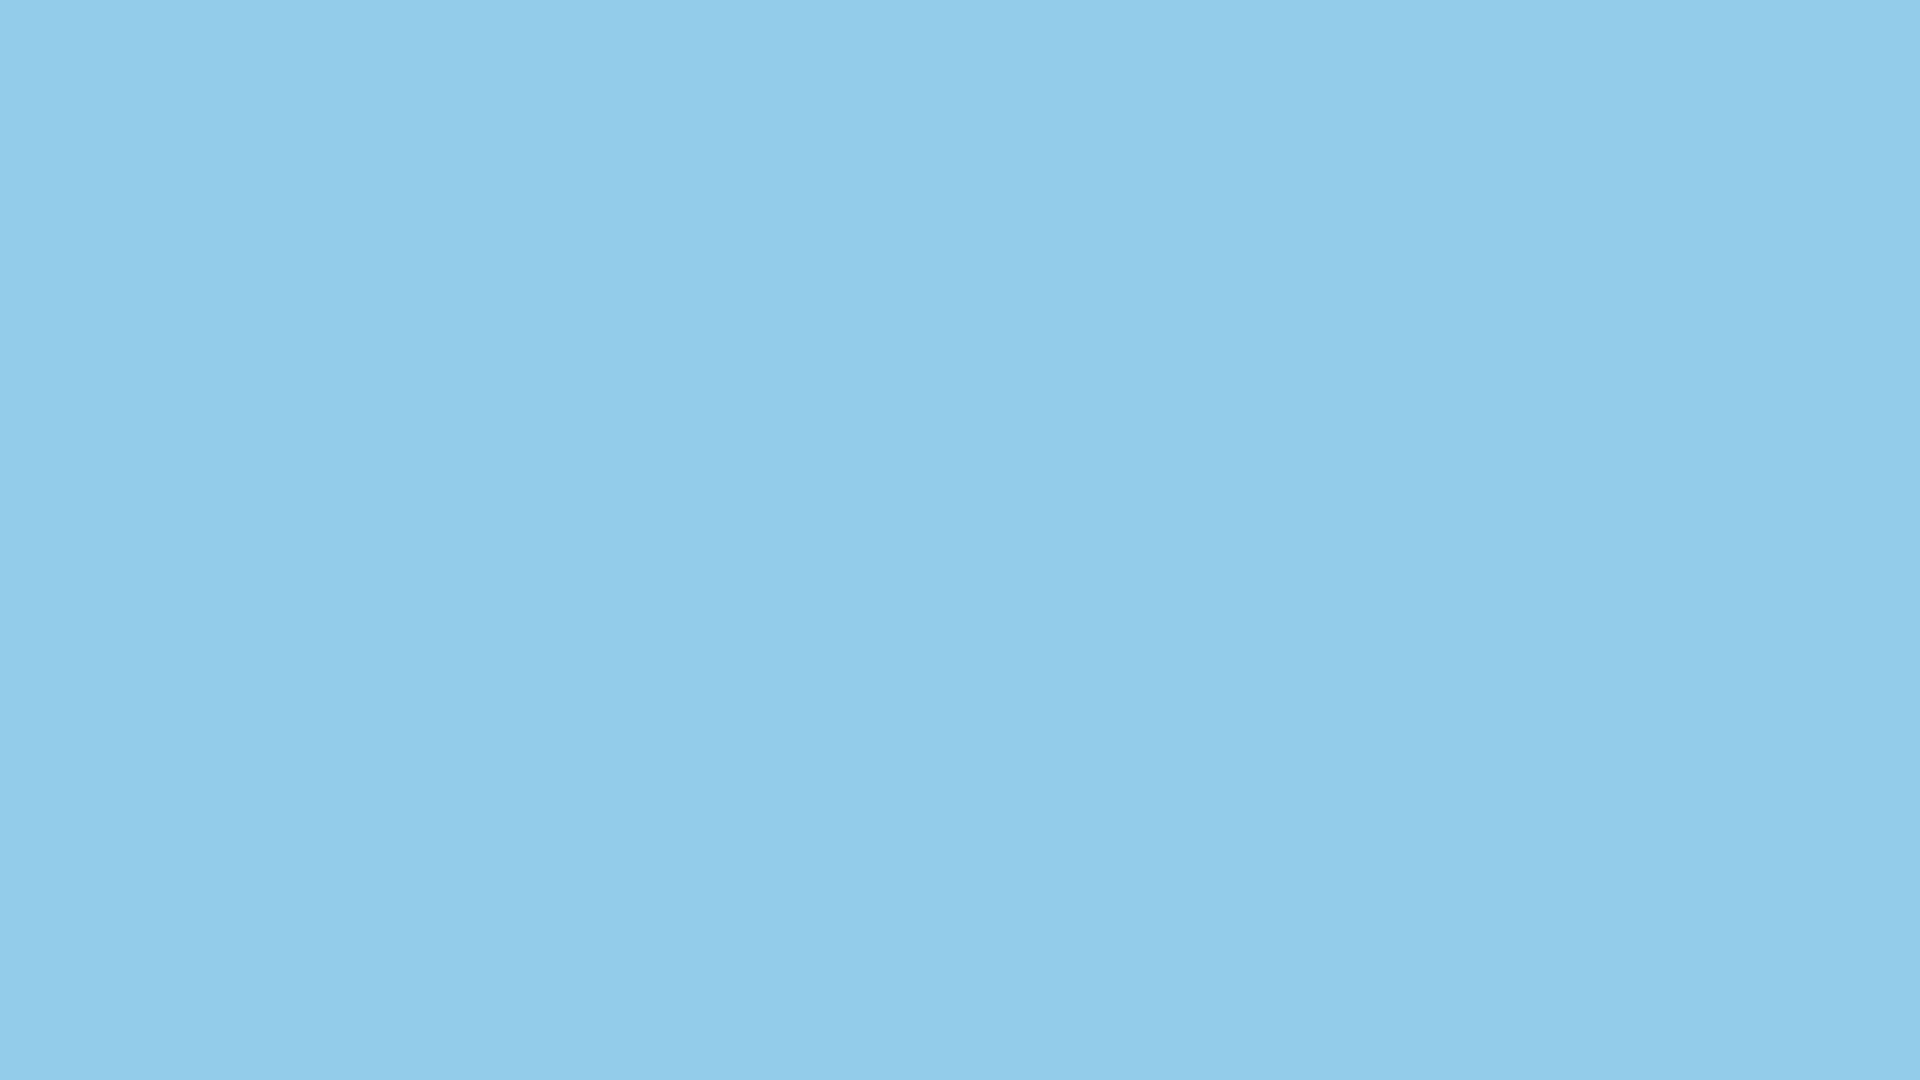 1920x1080 Light Cornflower Blue Solid Color Background